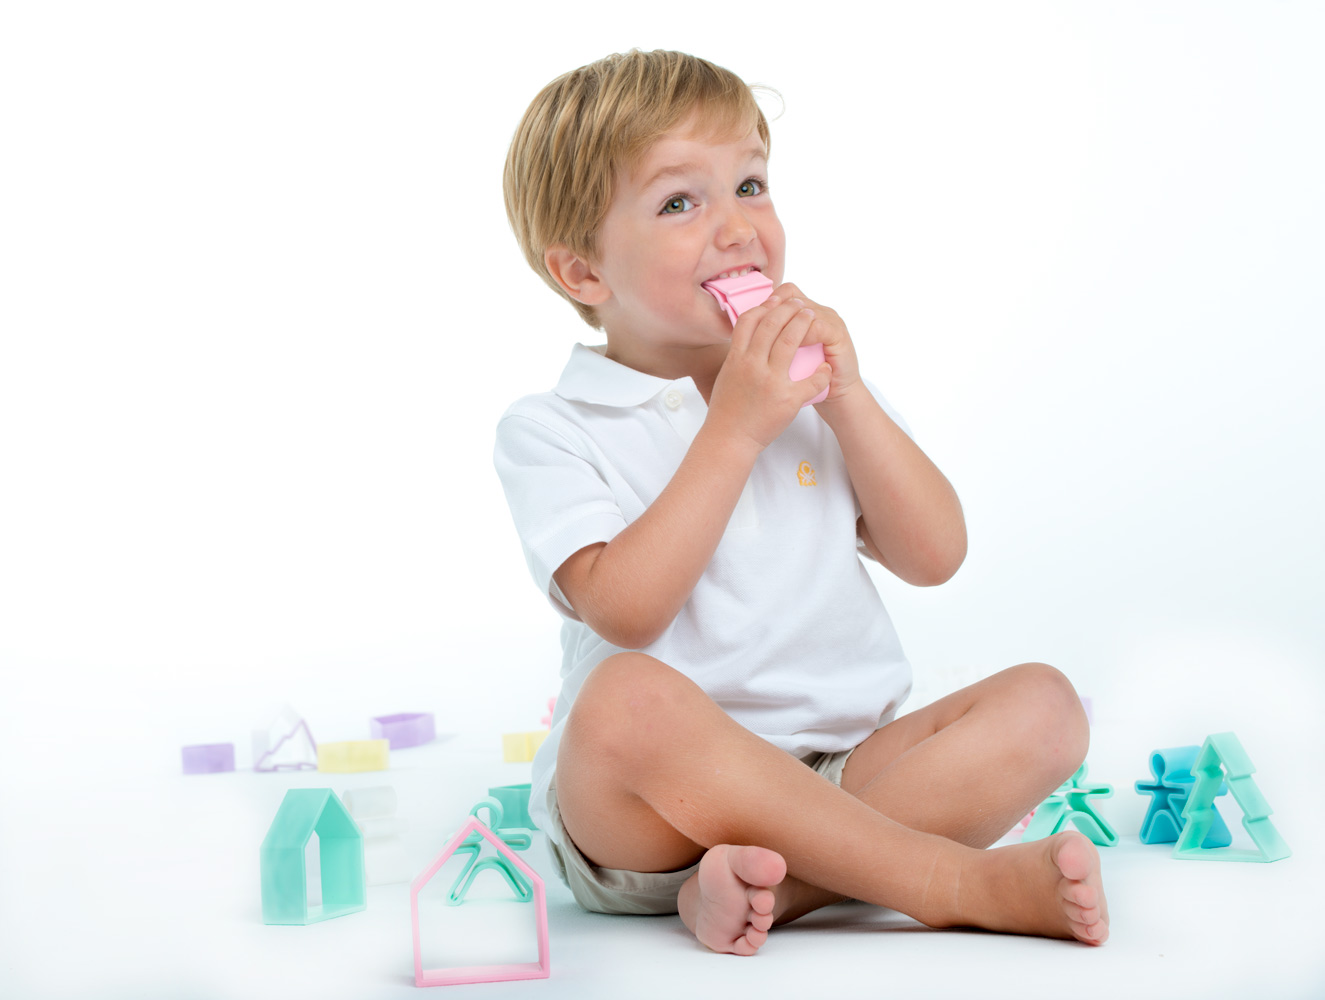 pastel-gallery-galeria-dena-kids-galeria-dena-tree-pack-6-juguetes-silicona-toys-4